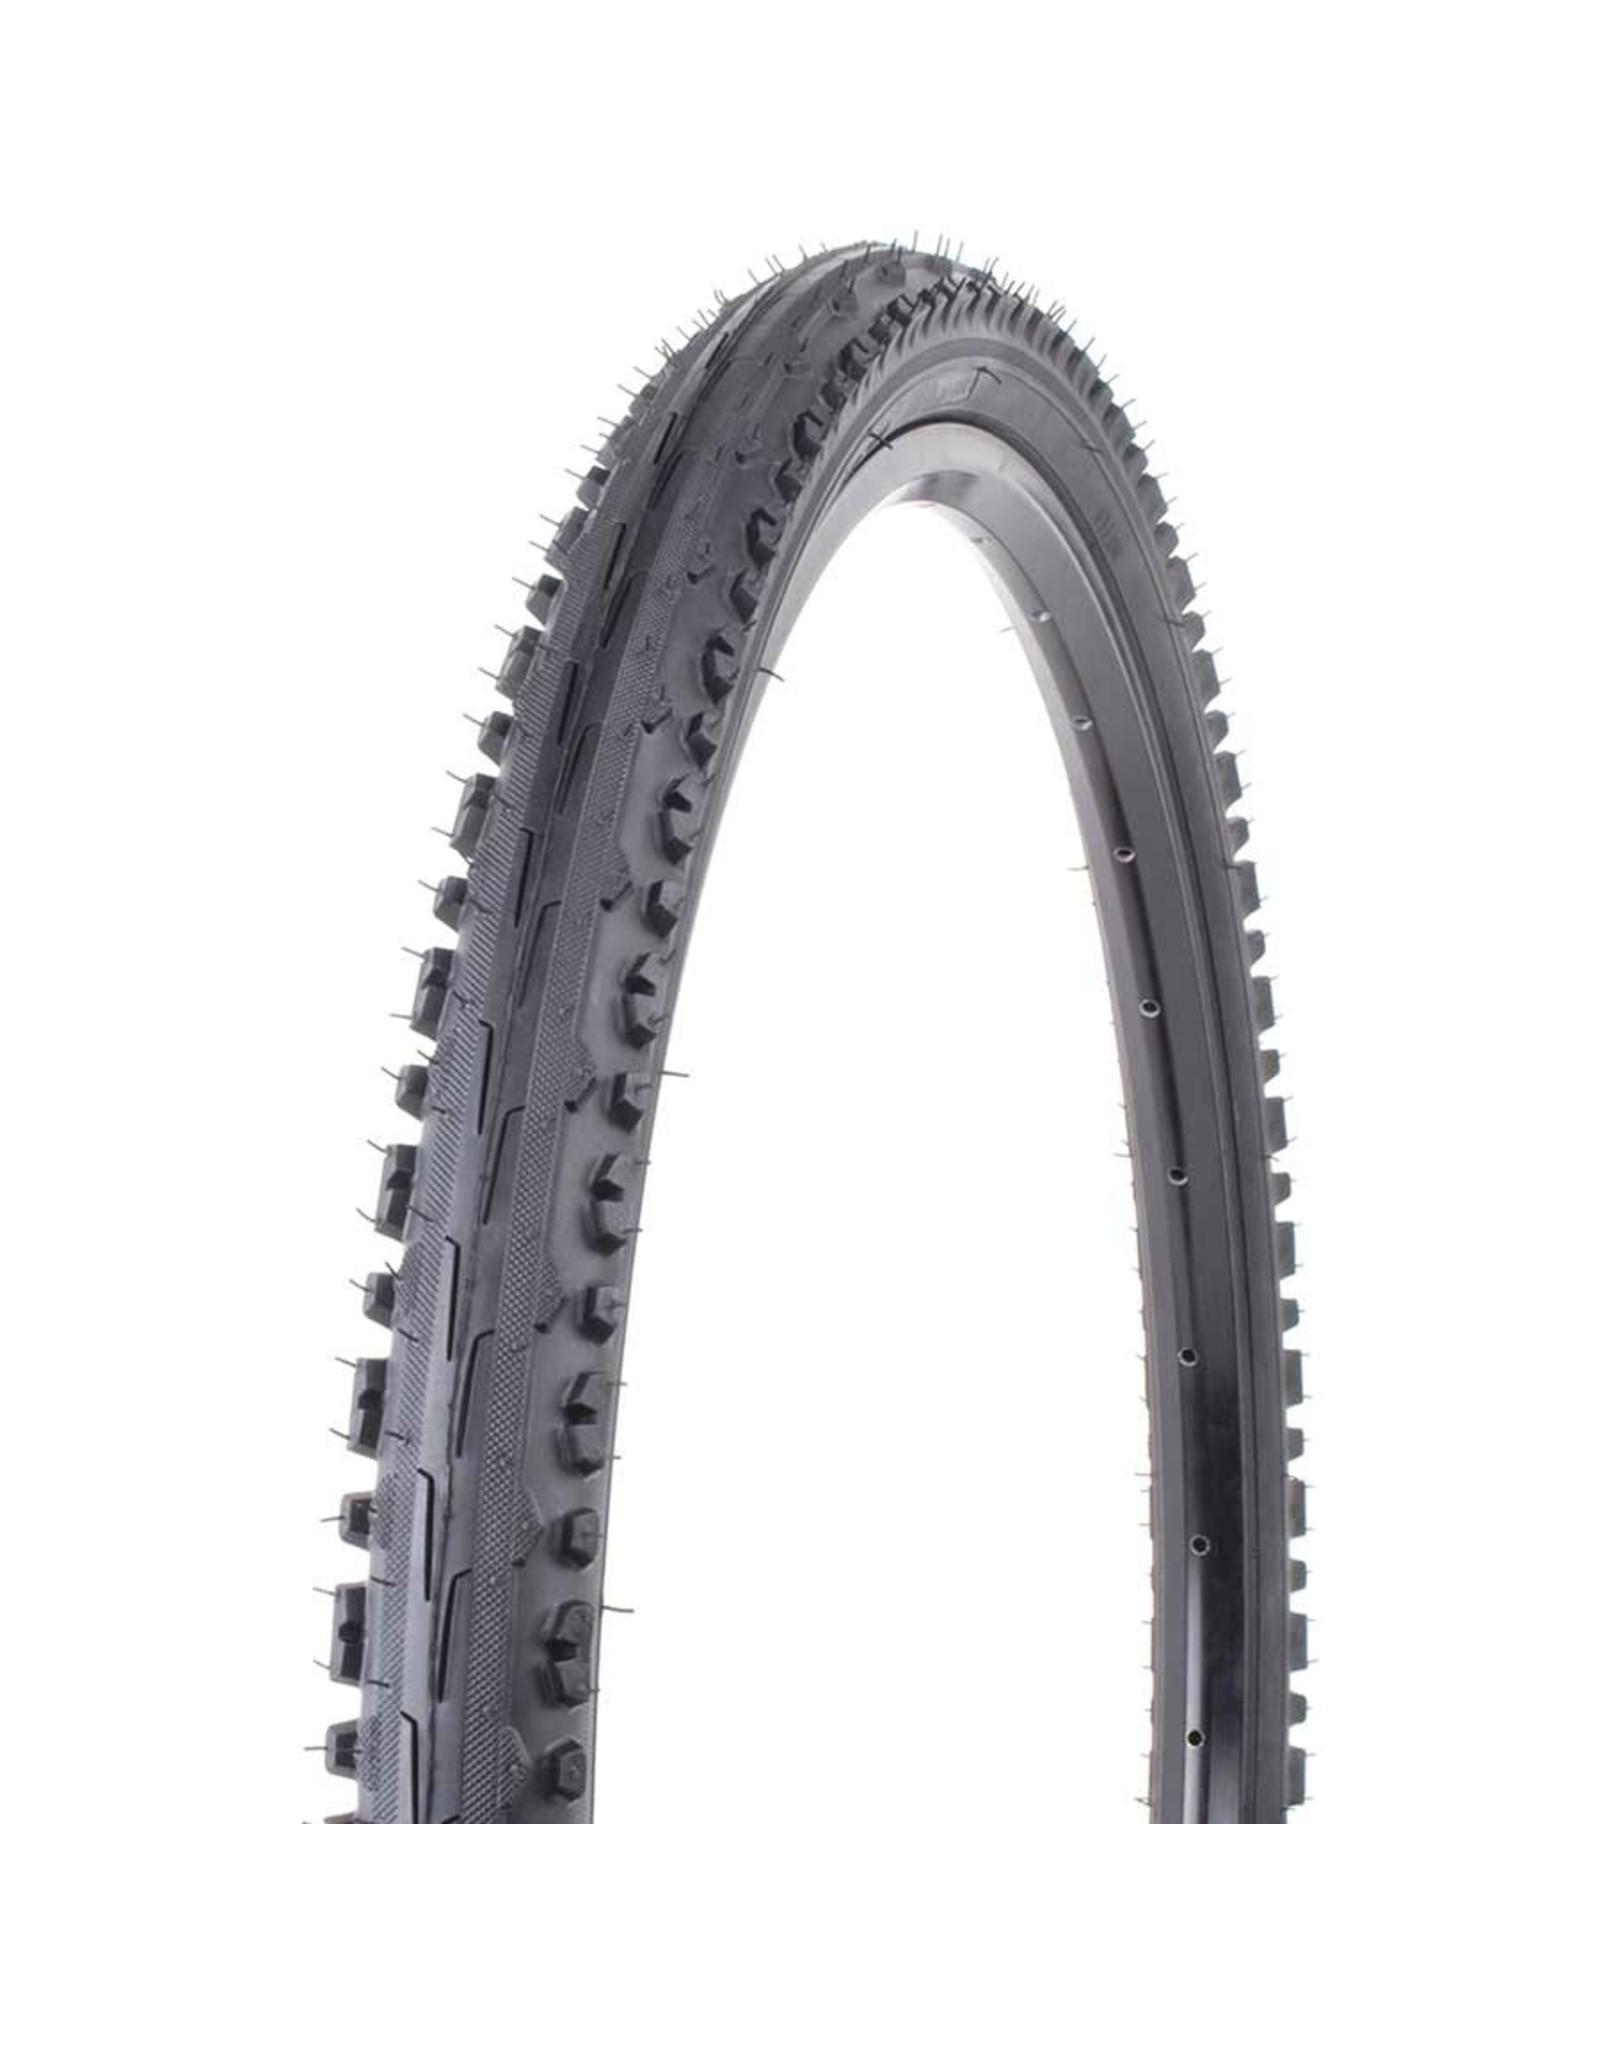 Kenda, Kross Plus, Tire, 26''x1.75, Wire, Clincher, SRC, 22TPI, Black